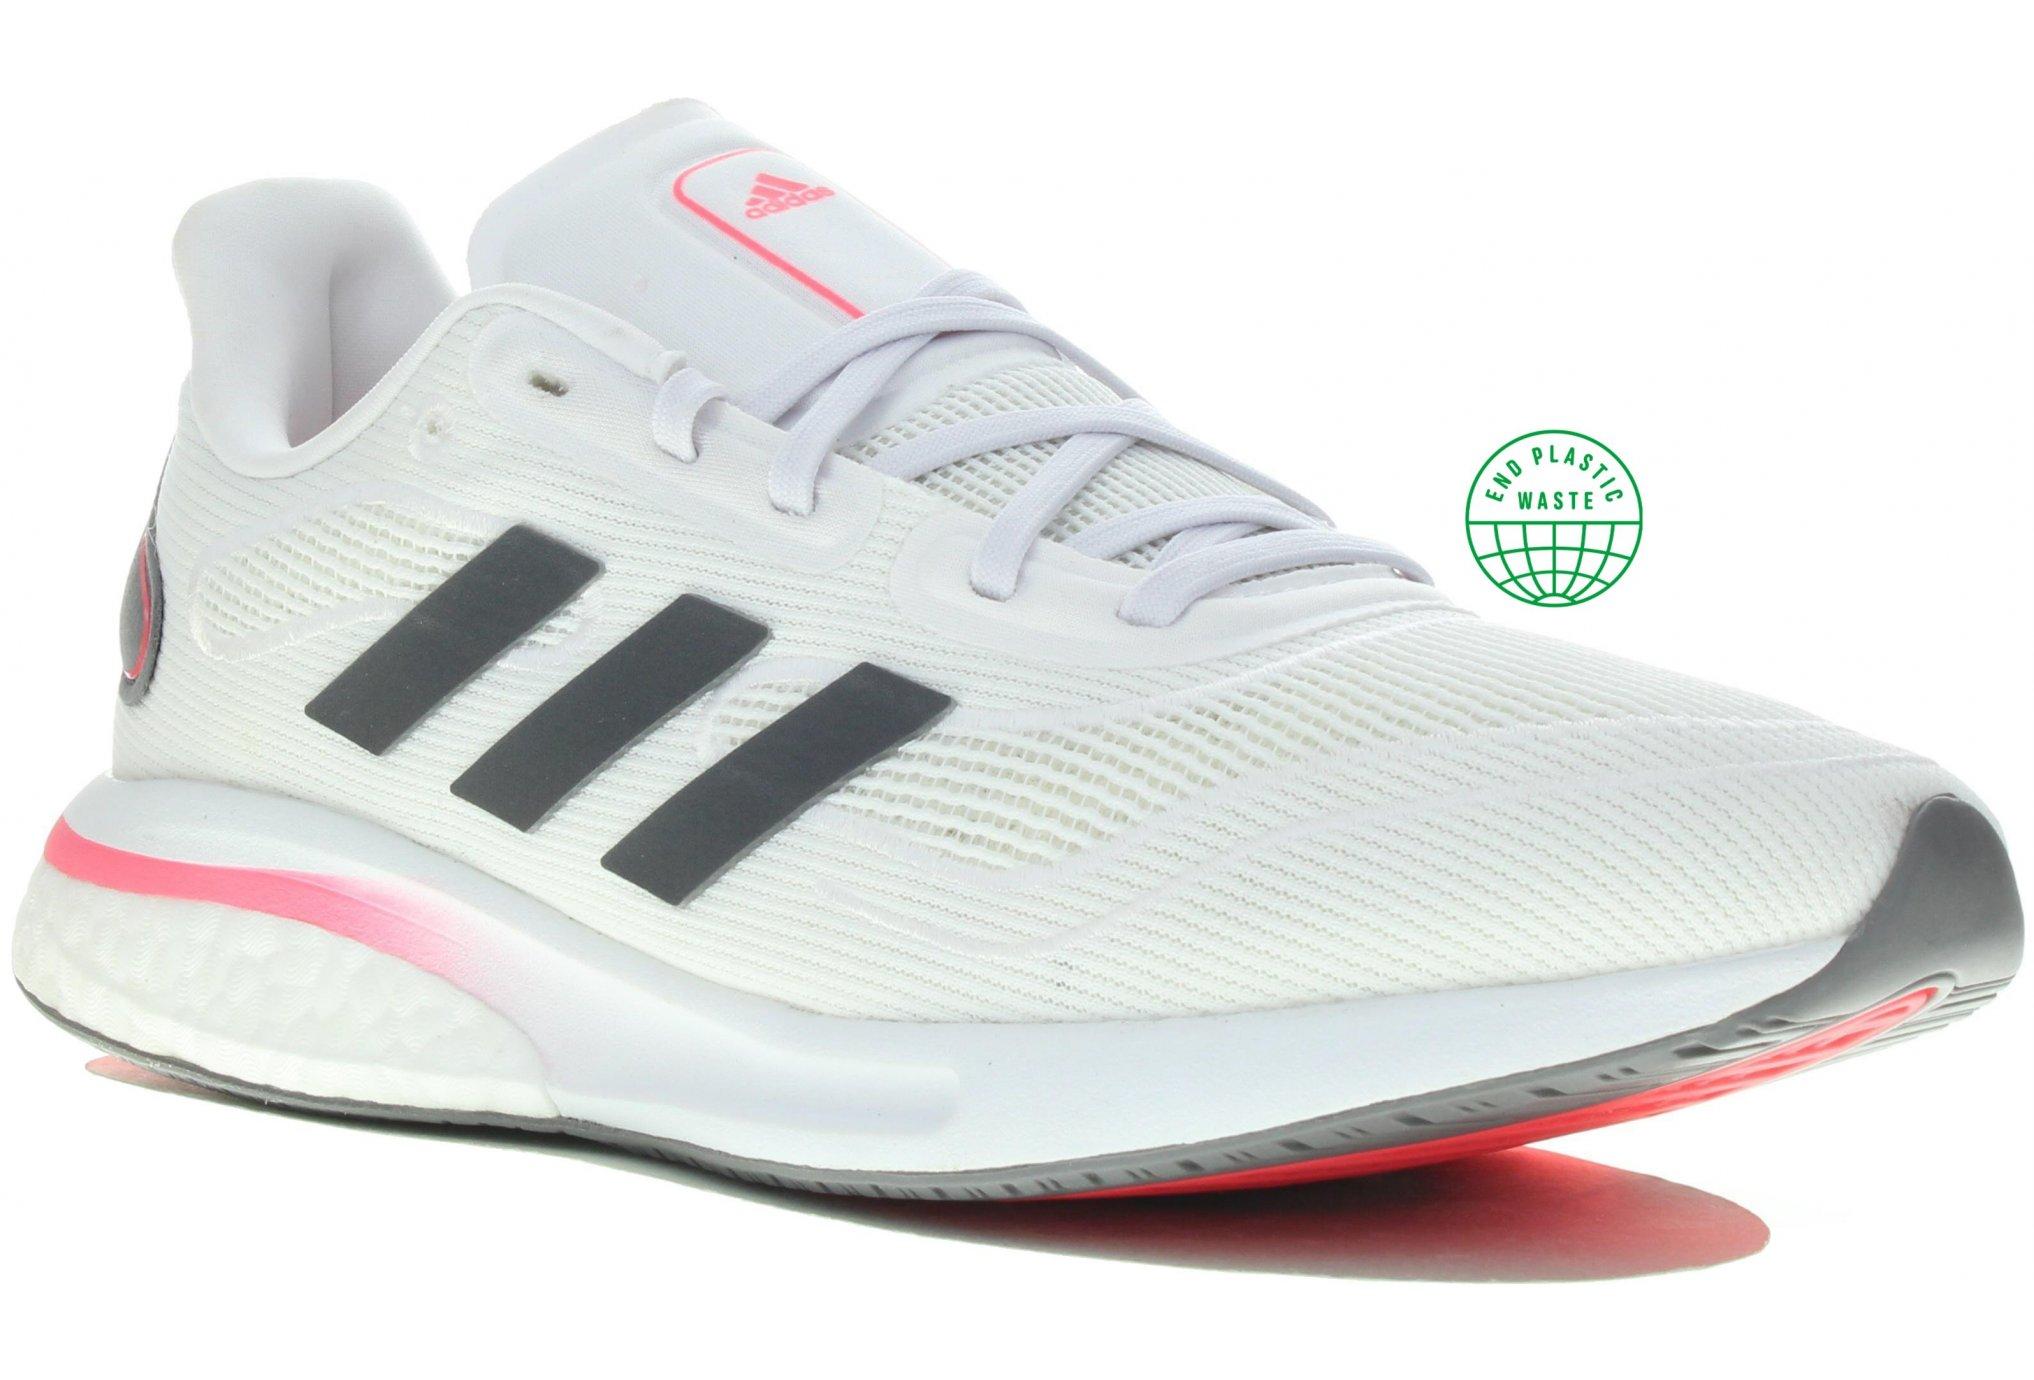 adidas Supernova Primegreen W Diététique Chaussures femme